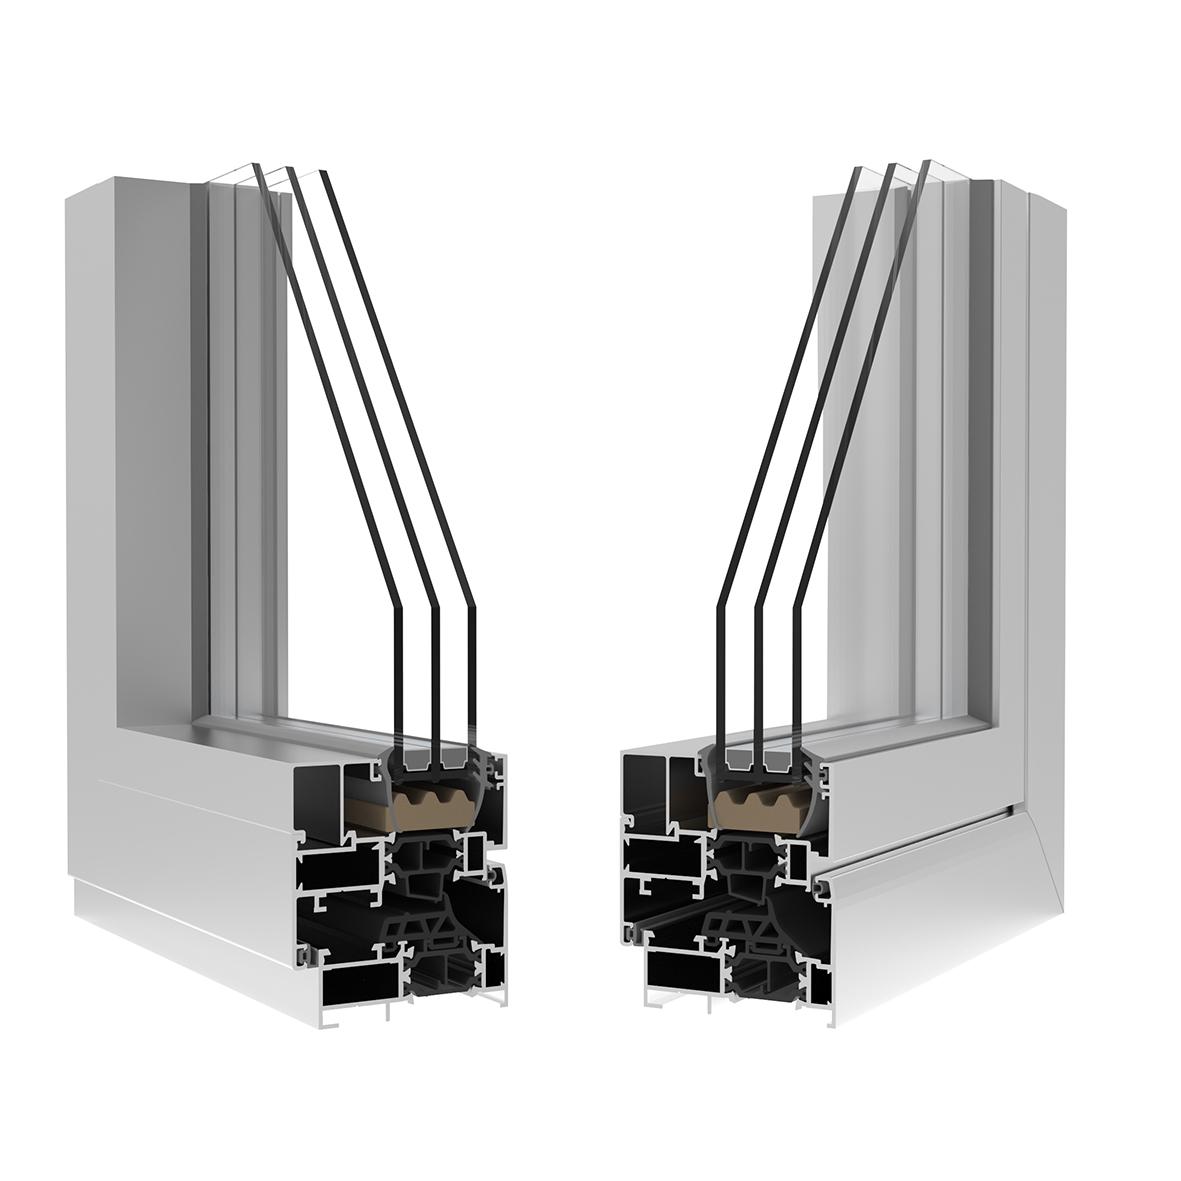 https://www.allpaint.it/wp-content/uploads/2021/07/thermika670-alluminio-allpaint.jpg